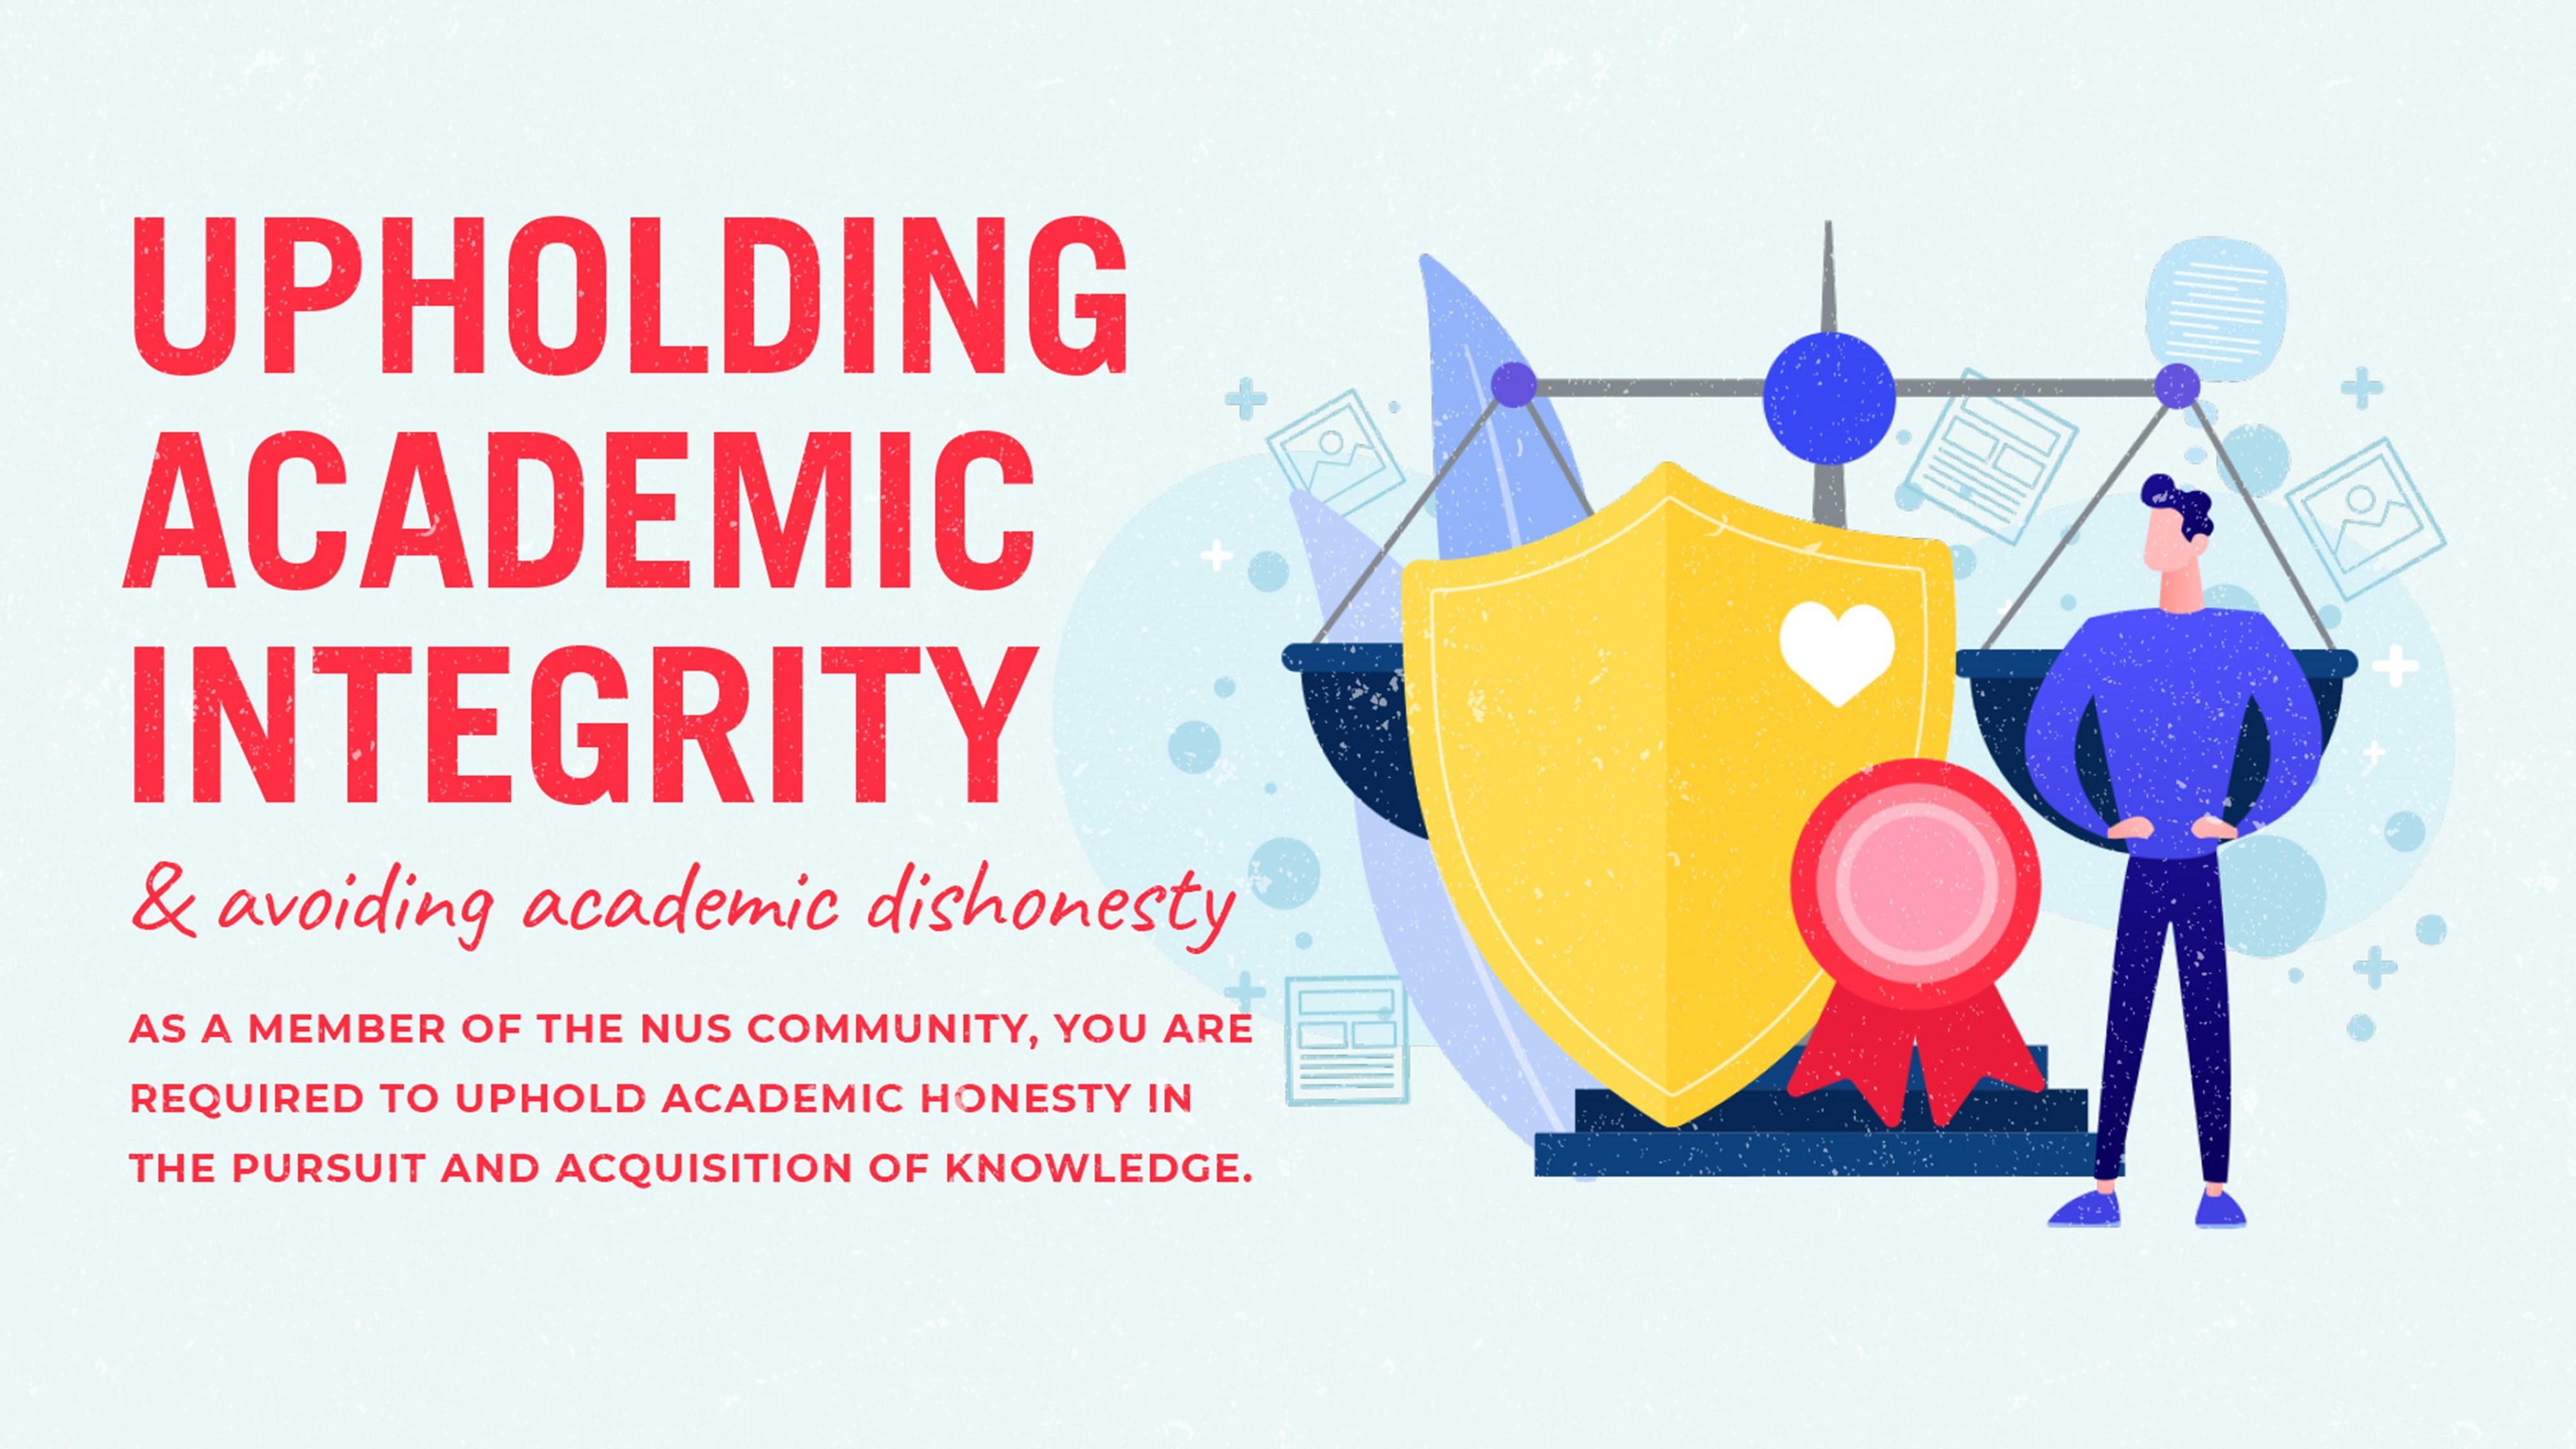 Basics about academic integrity